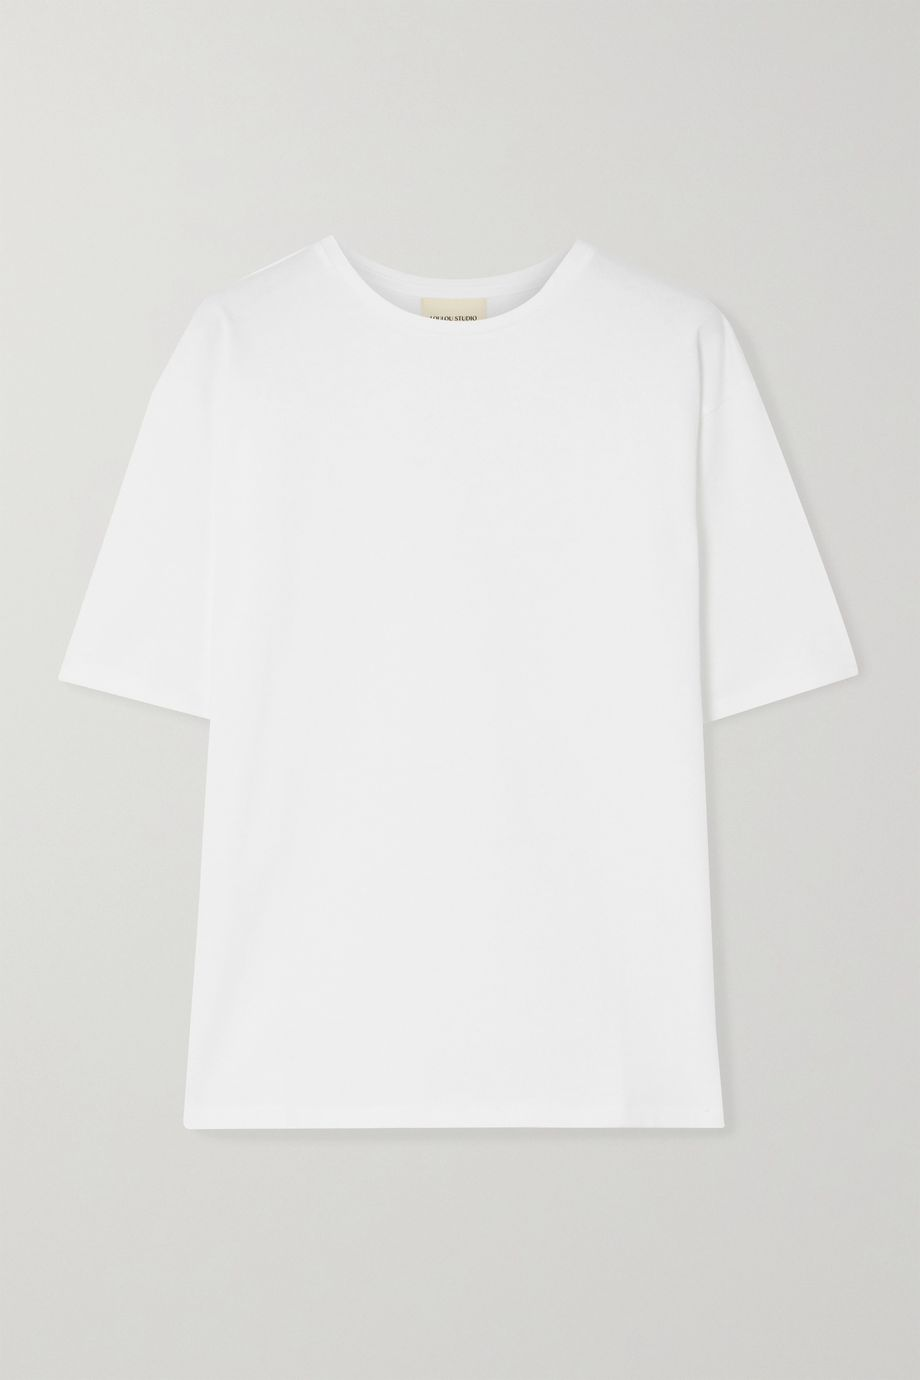 LOULOU STUDIO Lipari cotton-jersey T-shirt